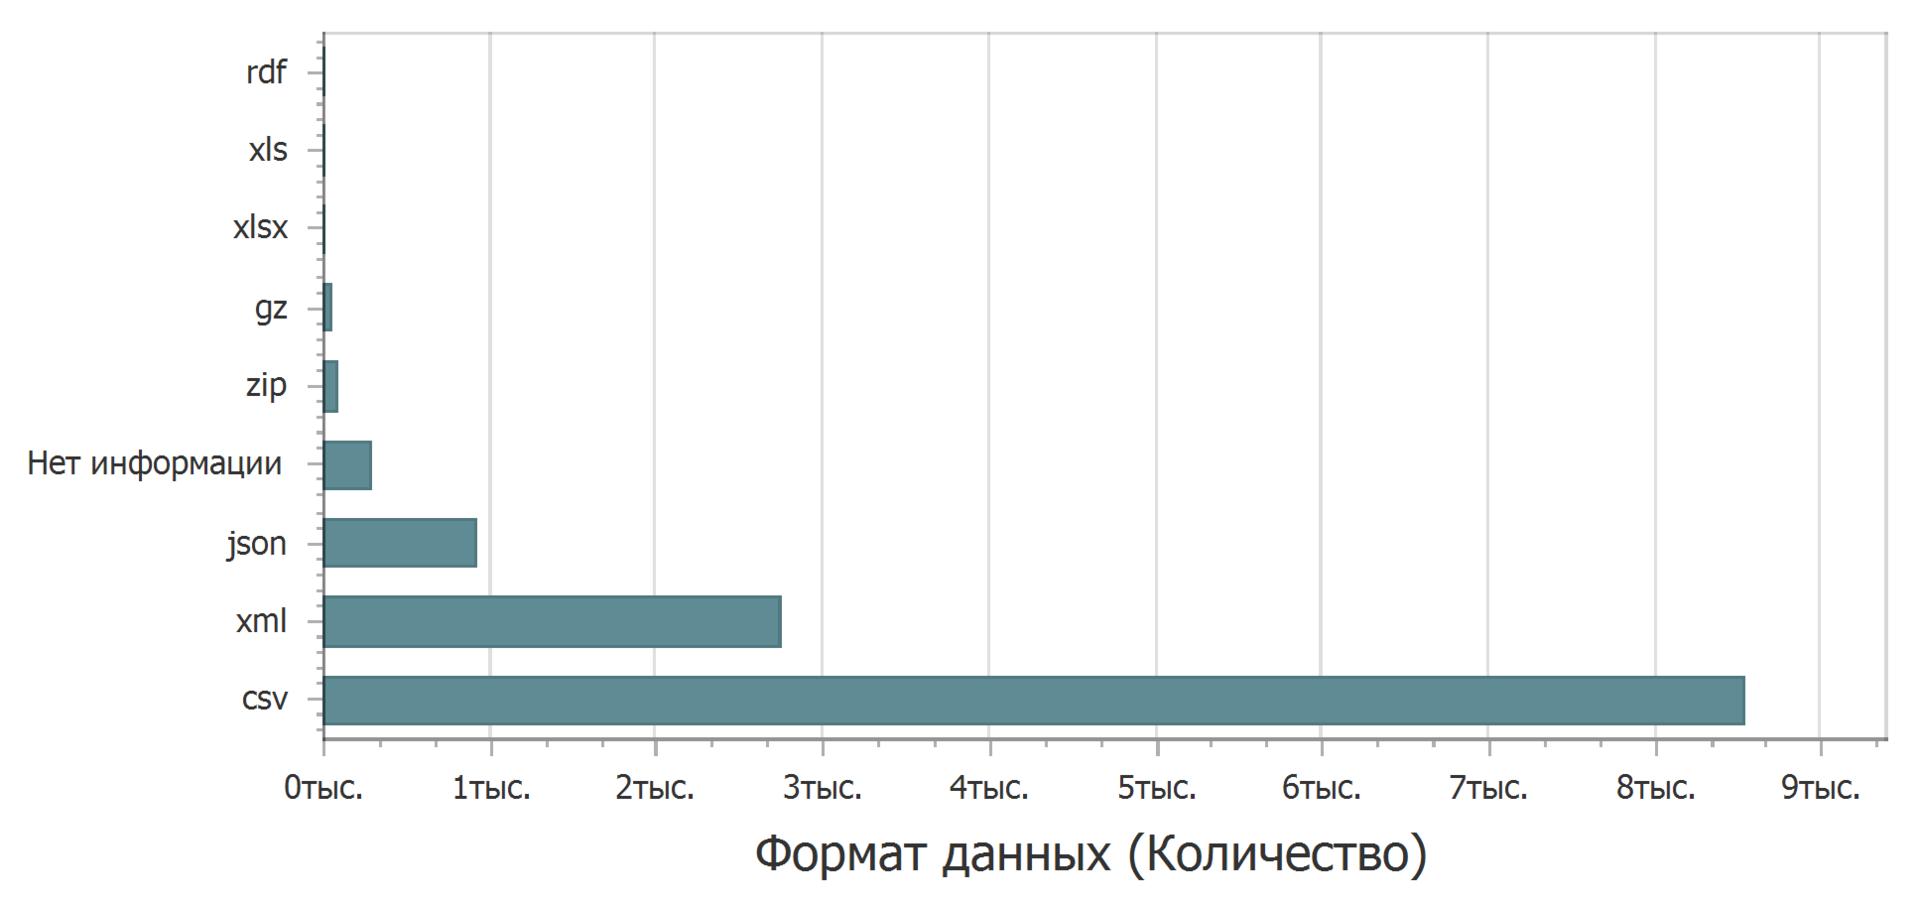 Анализ наборов данных с портала открытых данных data.gov.ru - 9